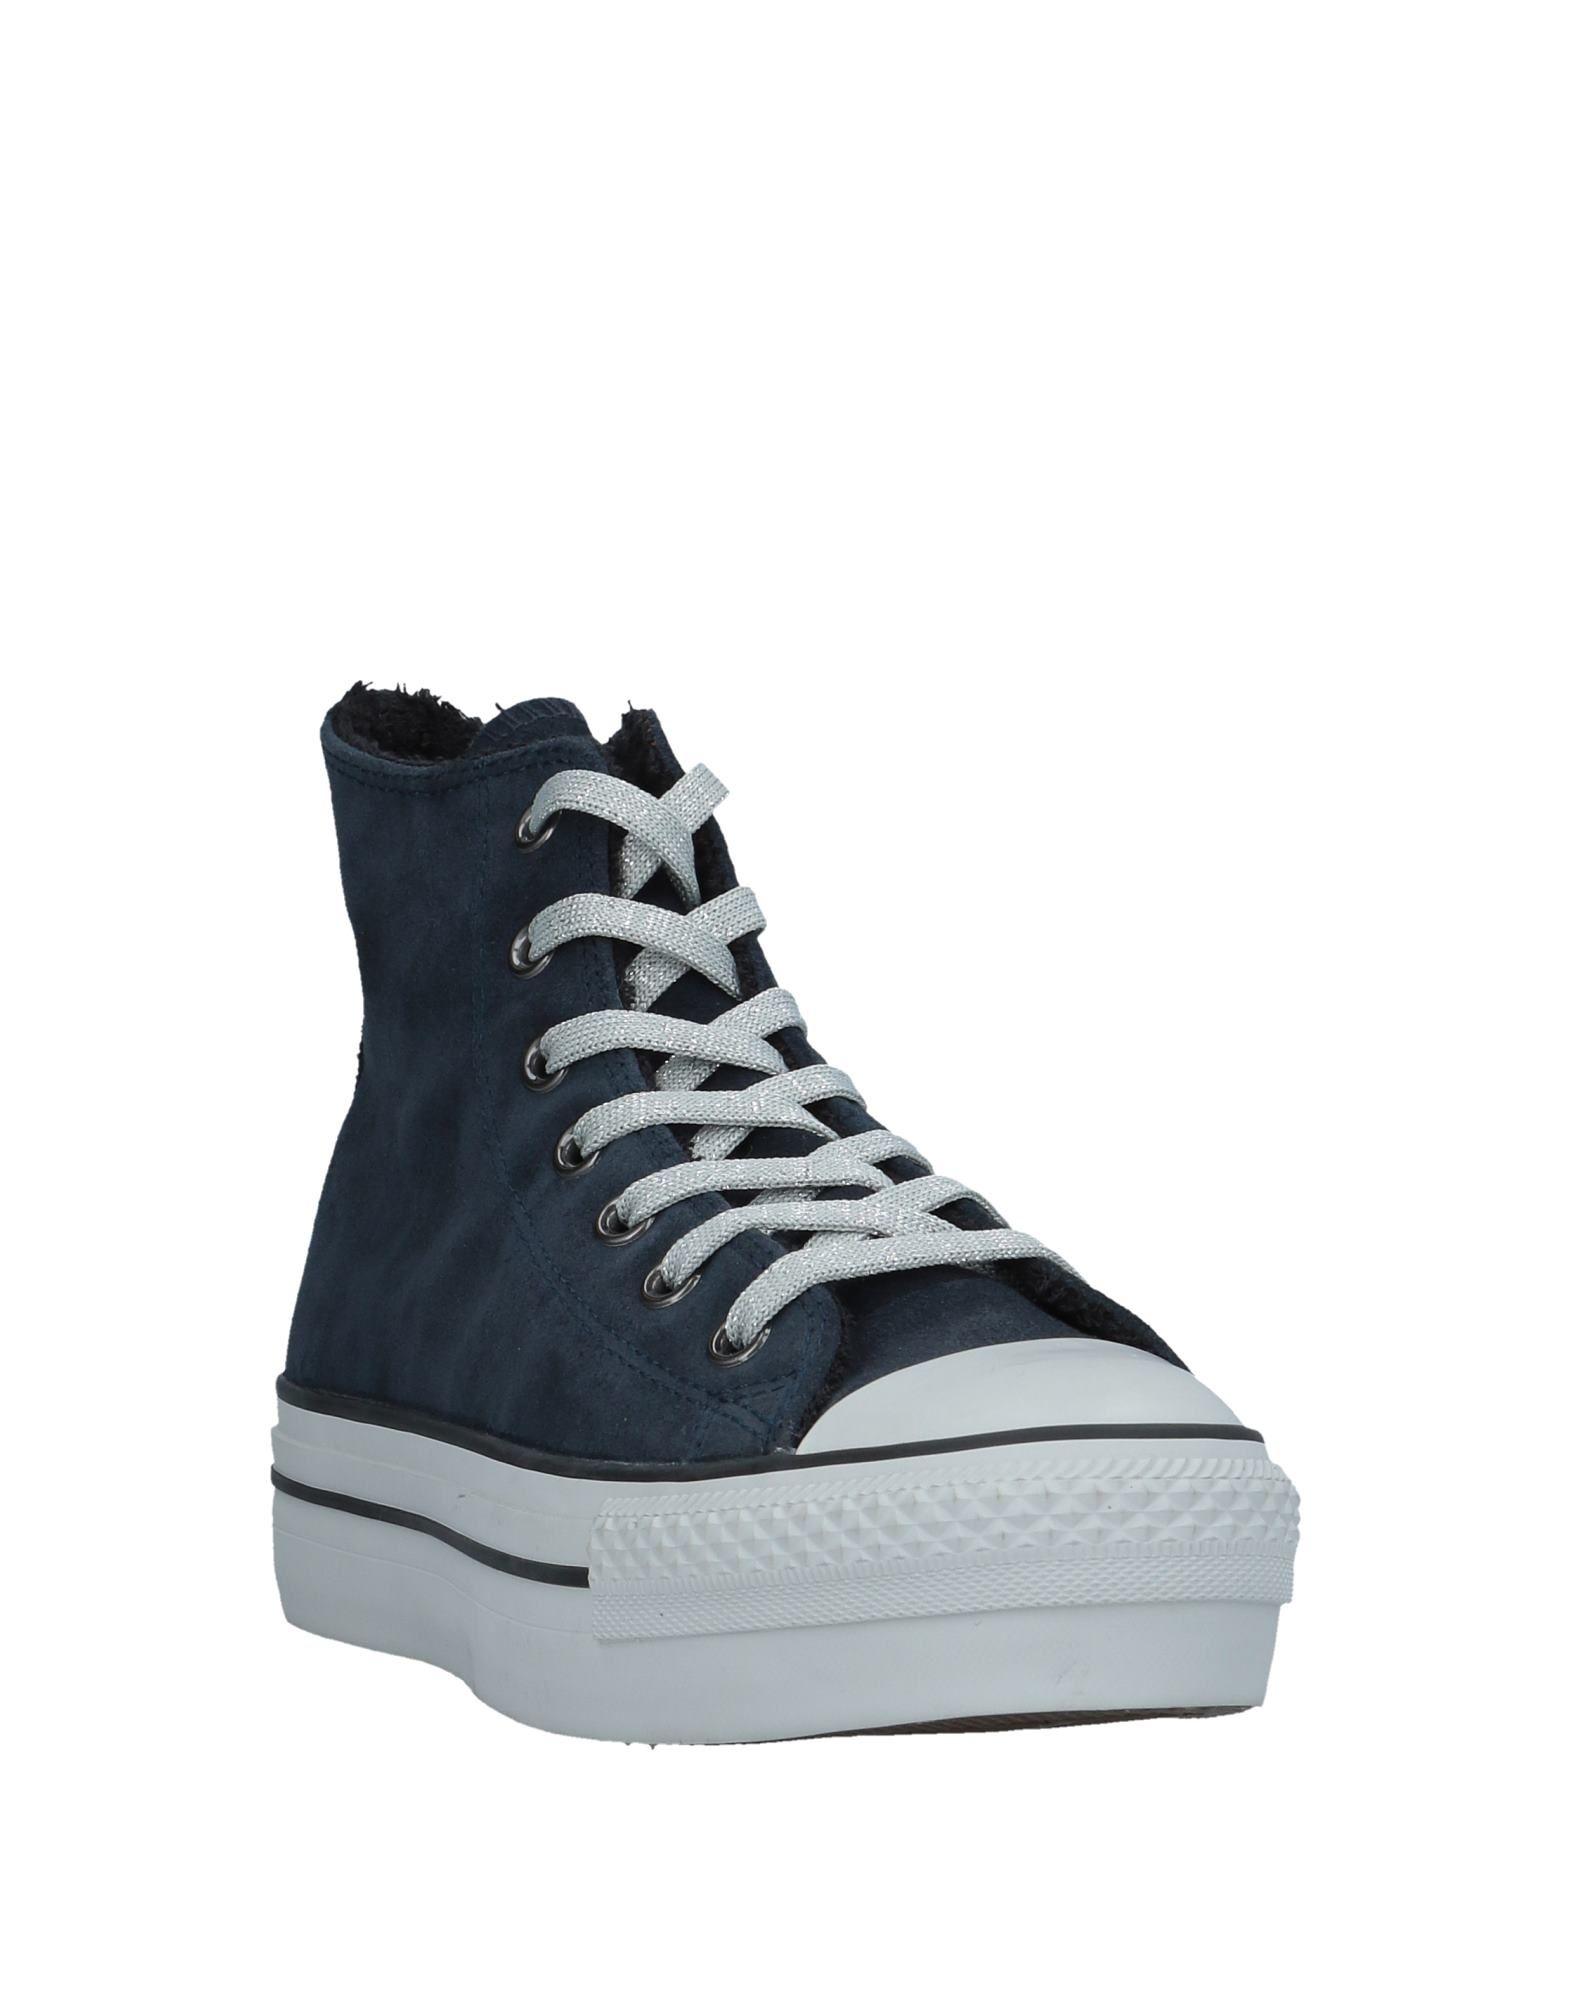 Converse 11522711NJ All Star Sneakers Damen  11522711NJ Converse Gute Qualität beliebte Schuhe 4e0e4e